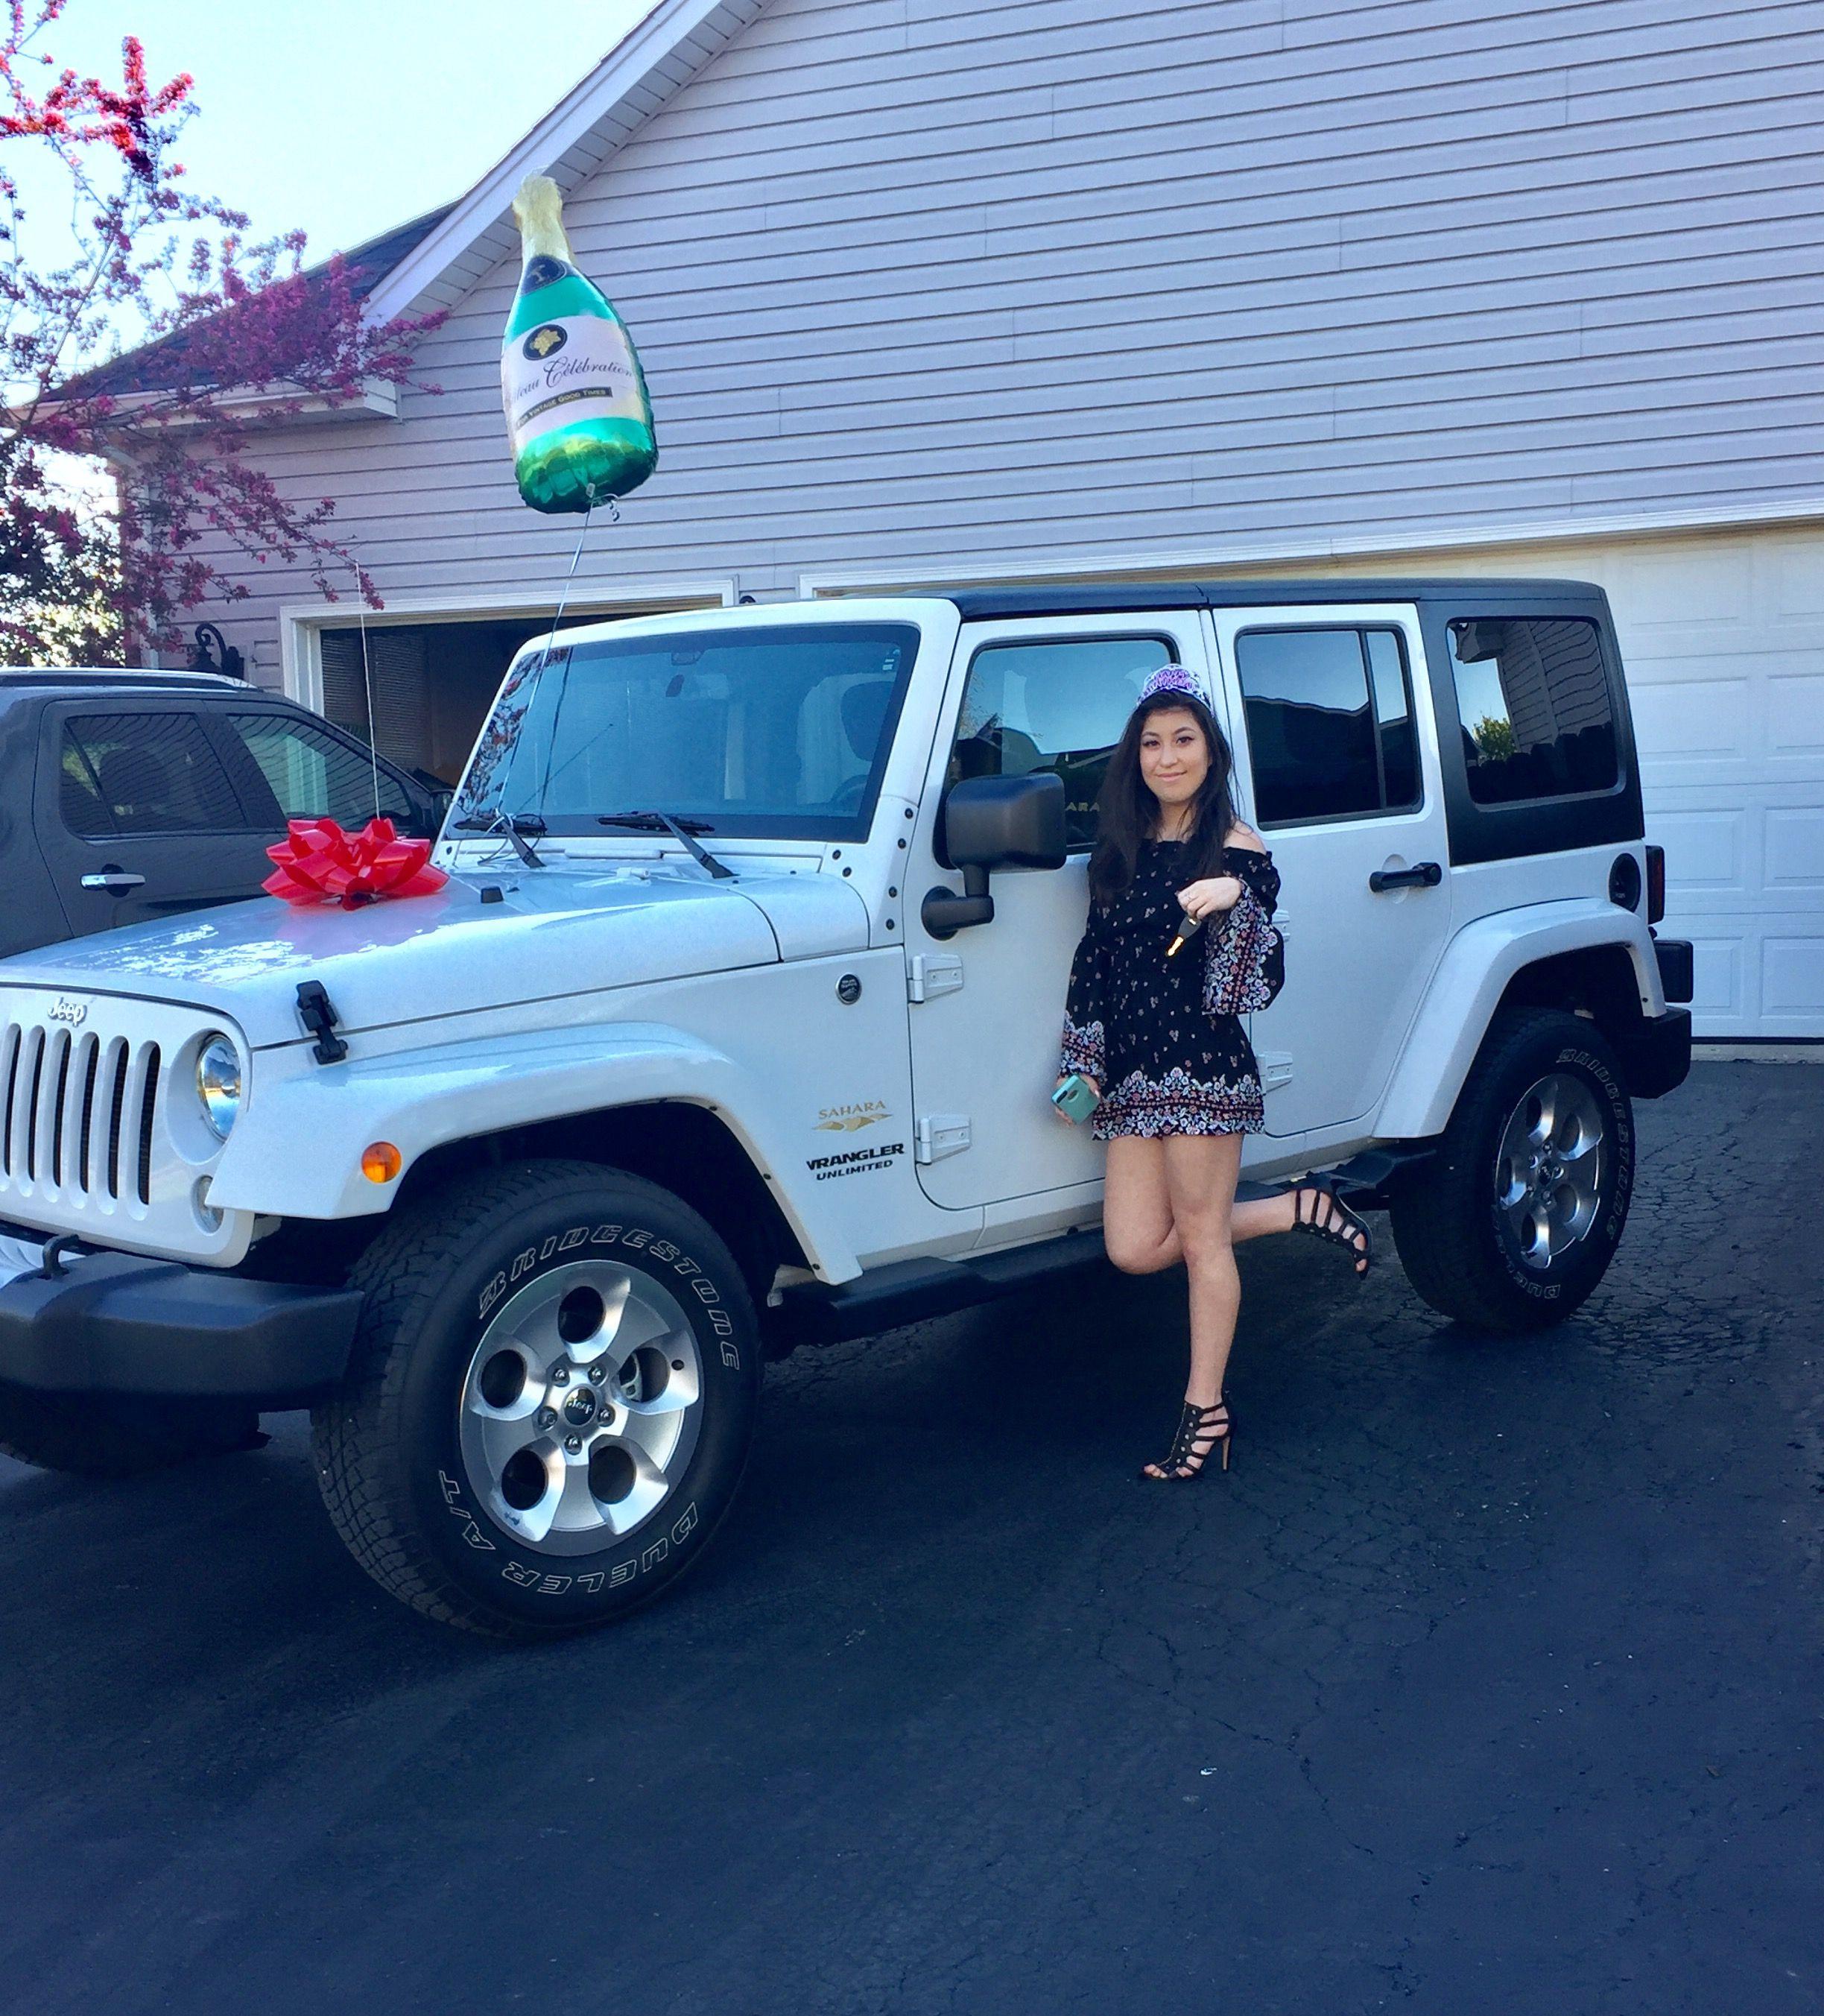 My 21st Birthday Present Jeep Wrangler Unlimited Sahara My Birthday Wish Came True My Dream Jeep 4 25 17 Jeep Suv Car